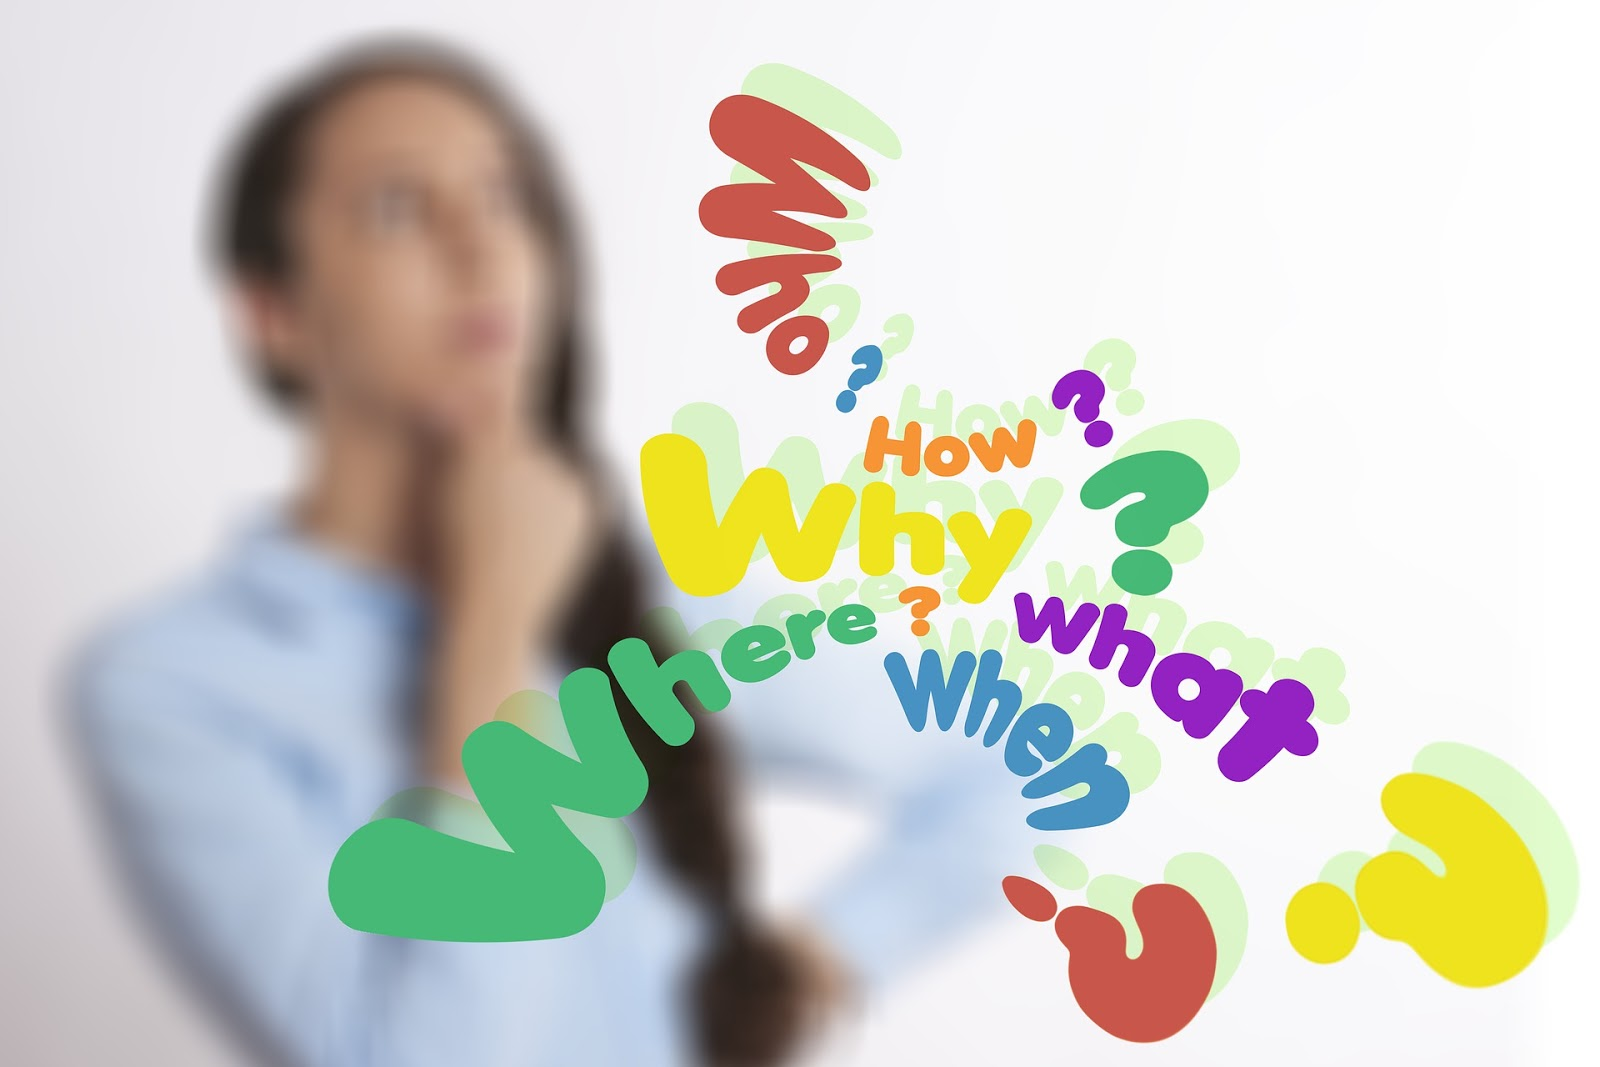 Pertanyaan Yang Sering Timbul Dalam Dunia Pijat Dan Jawabannya